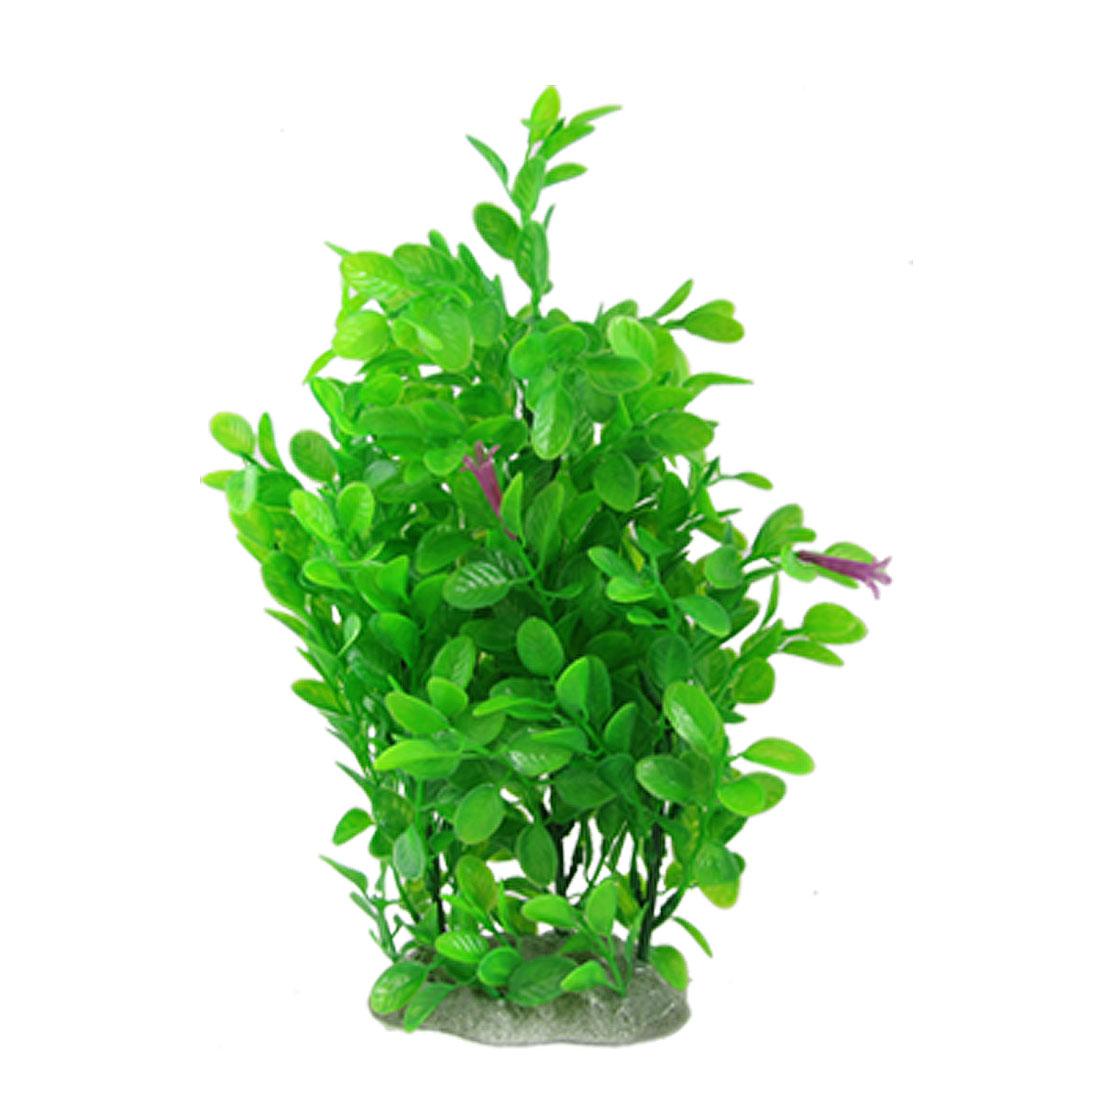 Purple Floral Green Grass Ornament Decor for Fish Tank